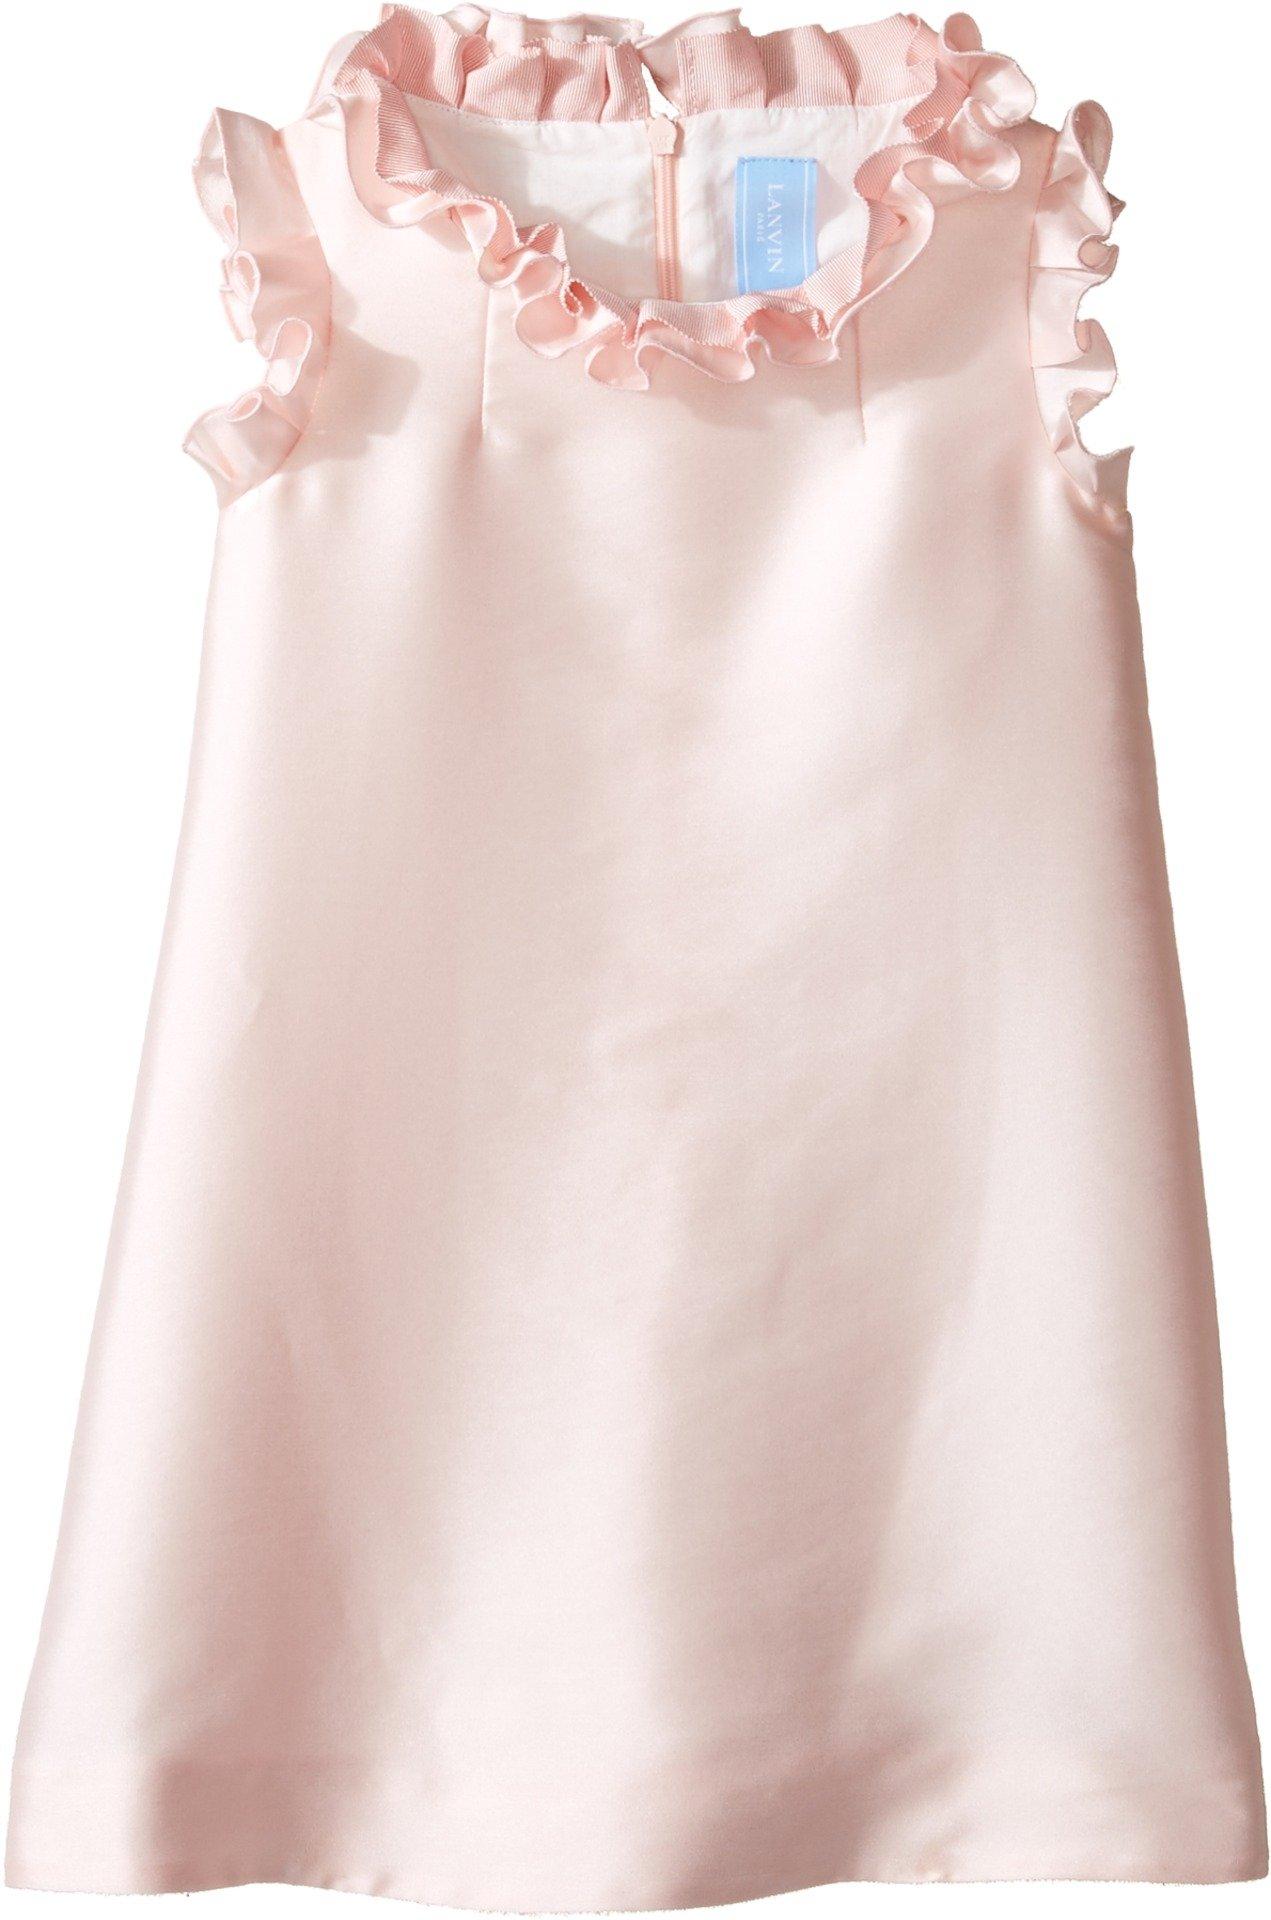 Lanvin Kids Baby Girl's Dress w/Ruffle Collar & Sleeve Detail (Toddler/Little Kids) Pink 4